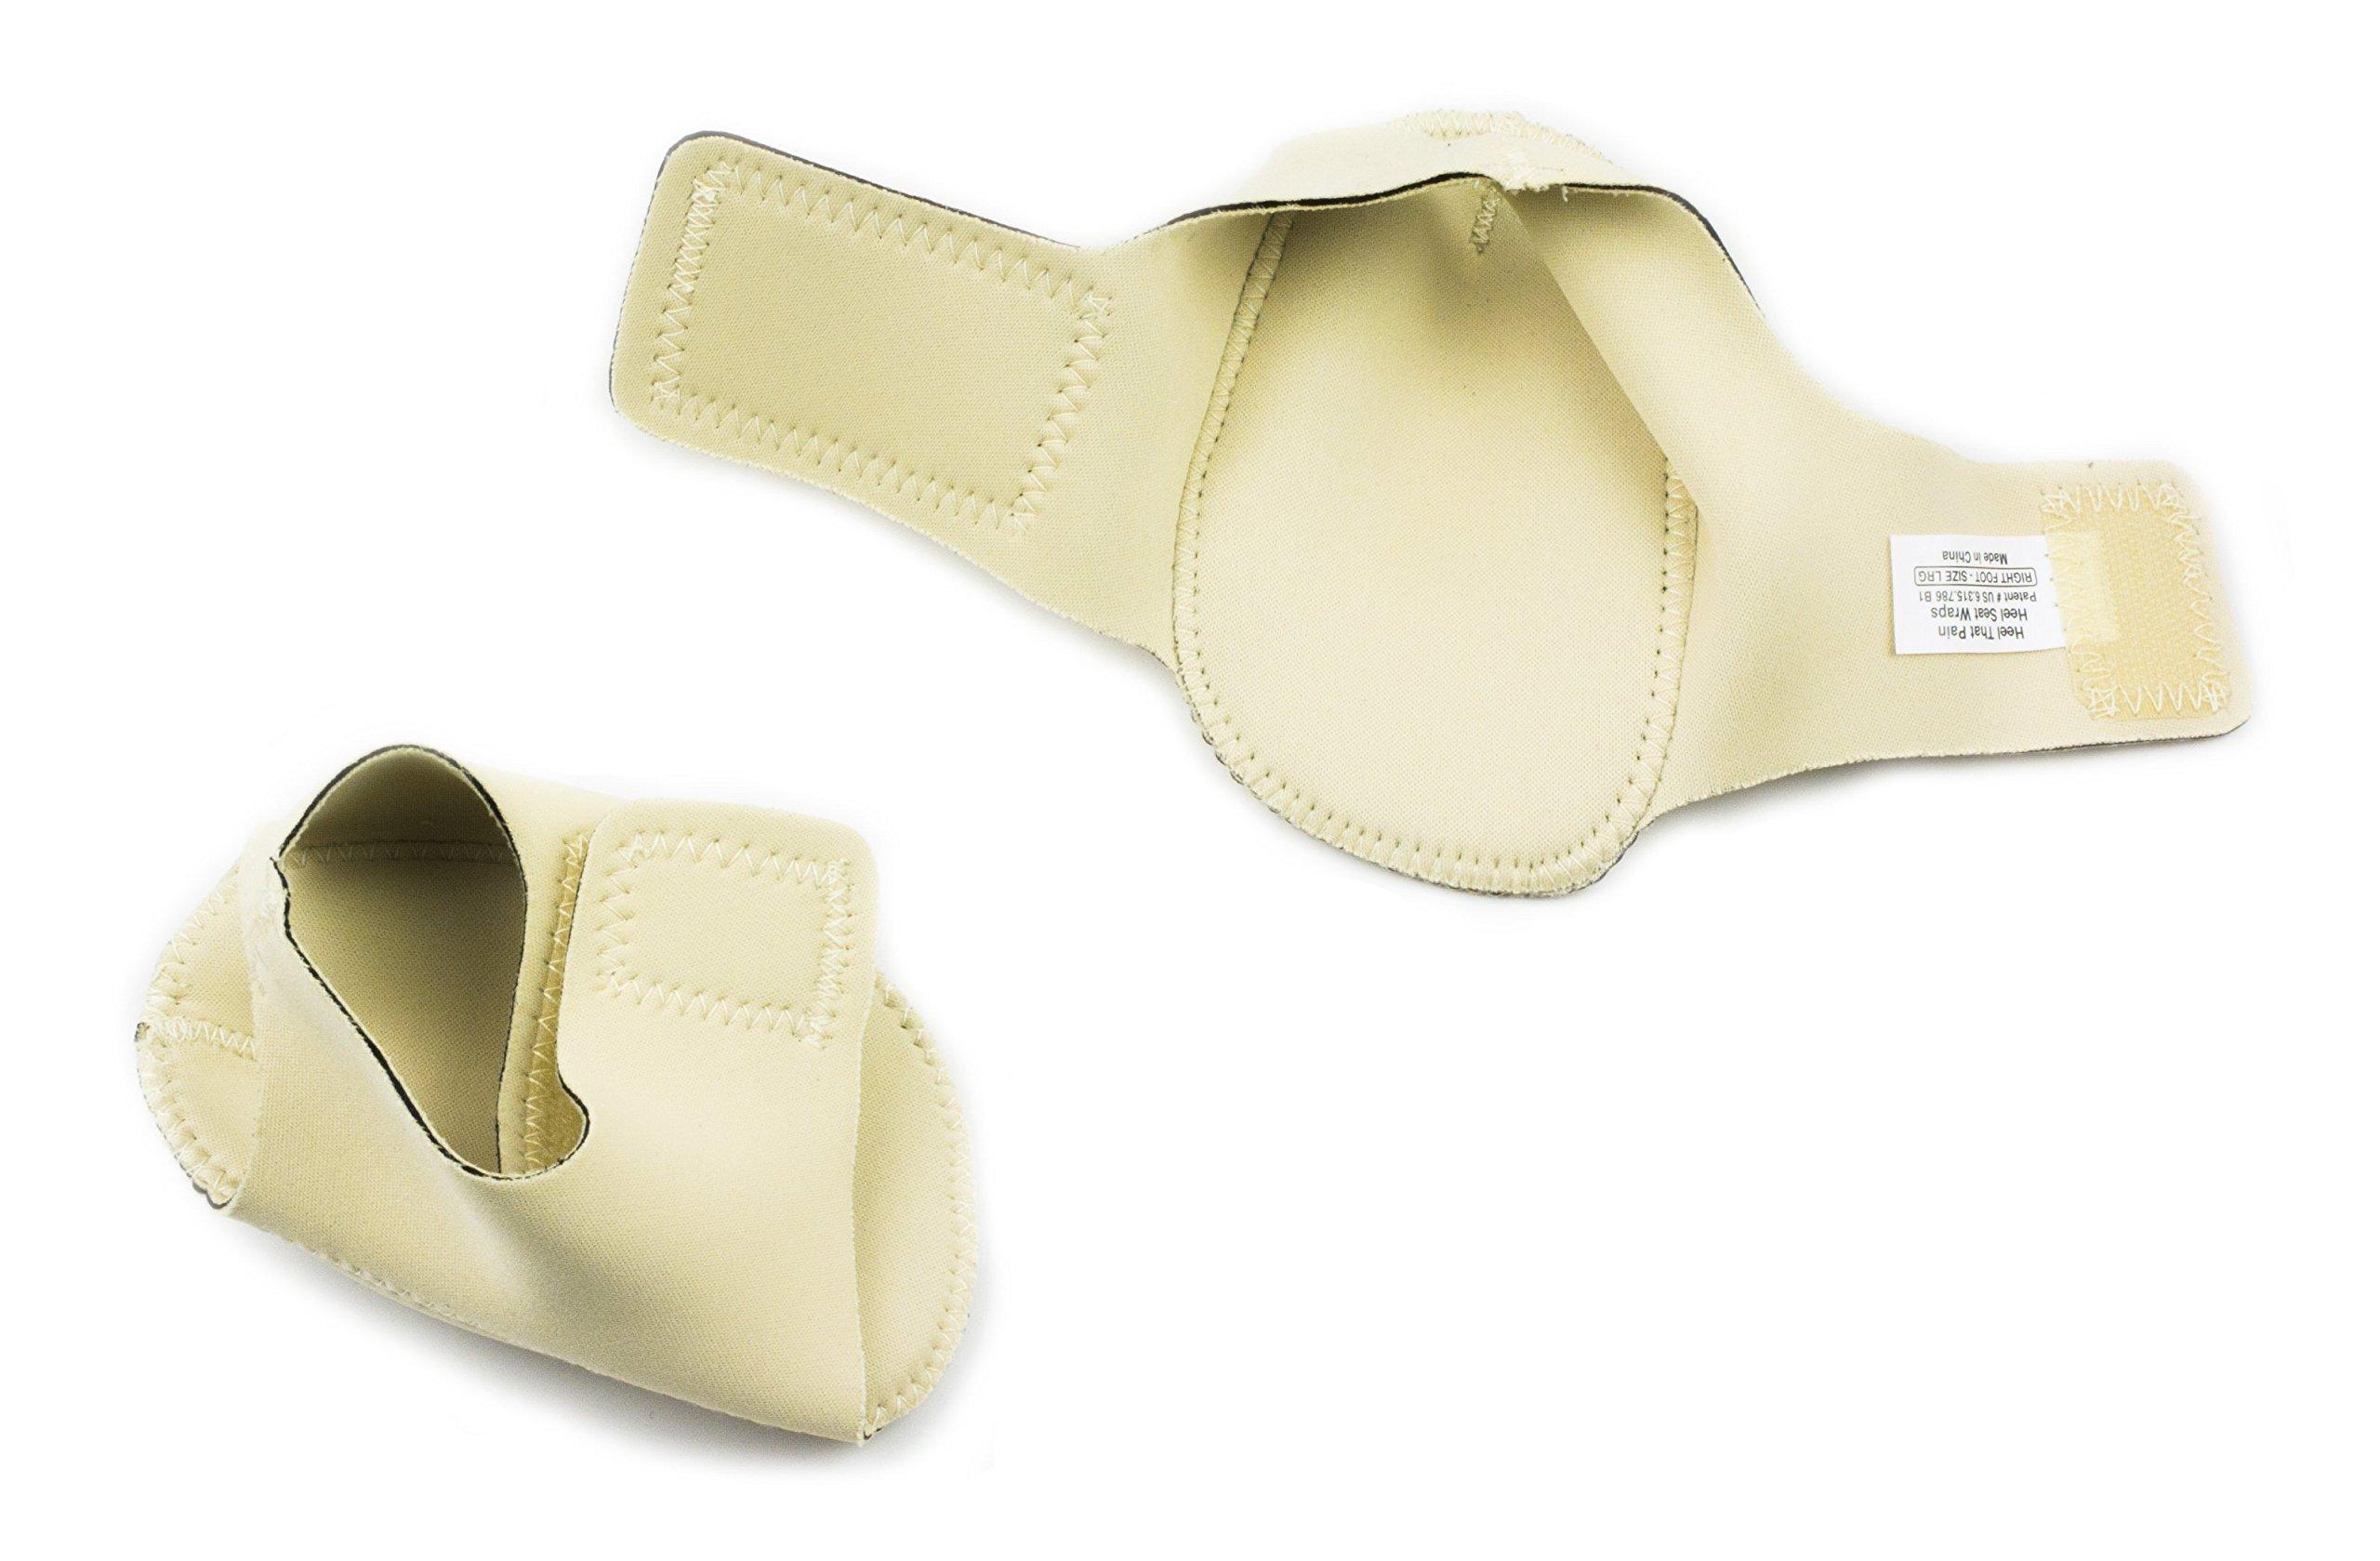 1586b6827fb94e Heel That Pain Heel Seat Wraps for Plantar Fasciitis and Heel Spurs ...